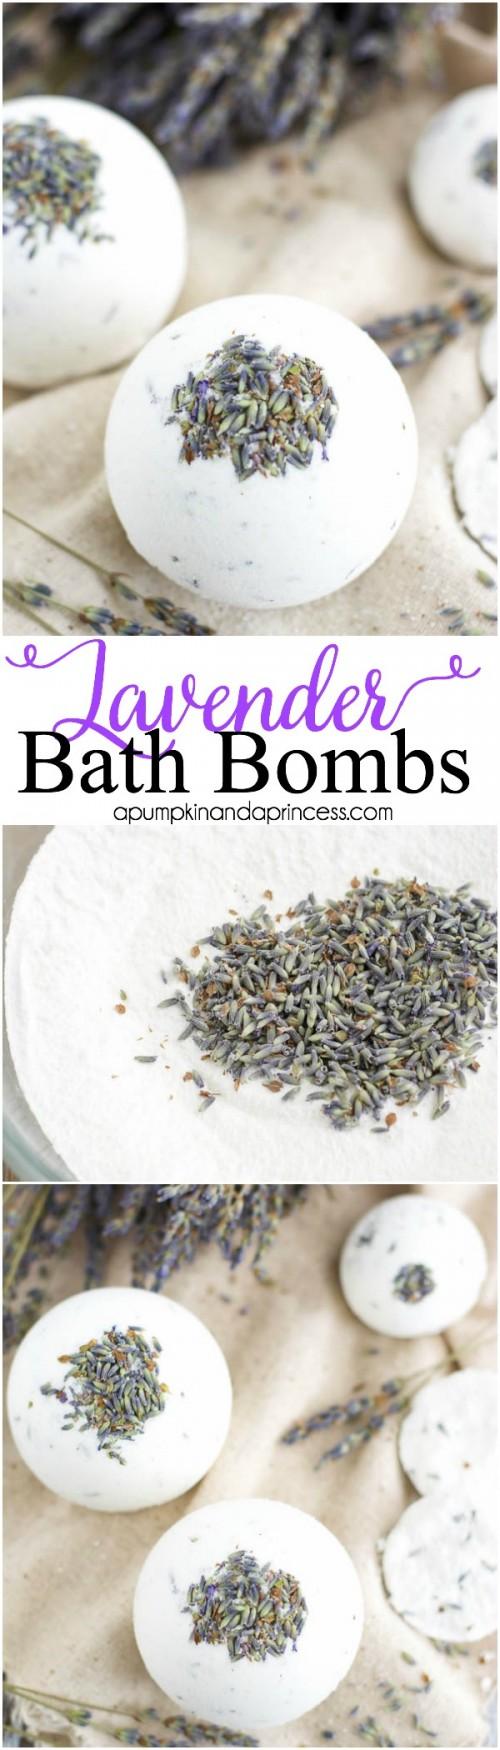 lavender bath bombs (via apumpkinandaprincess)